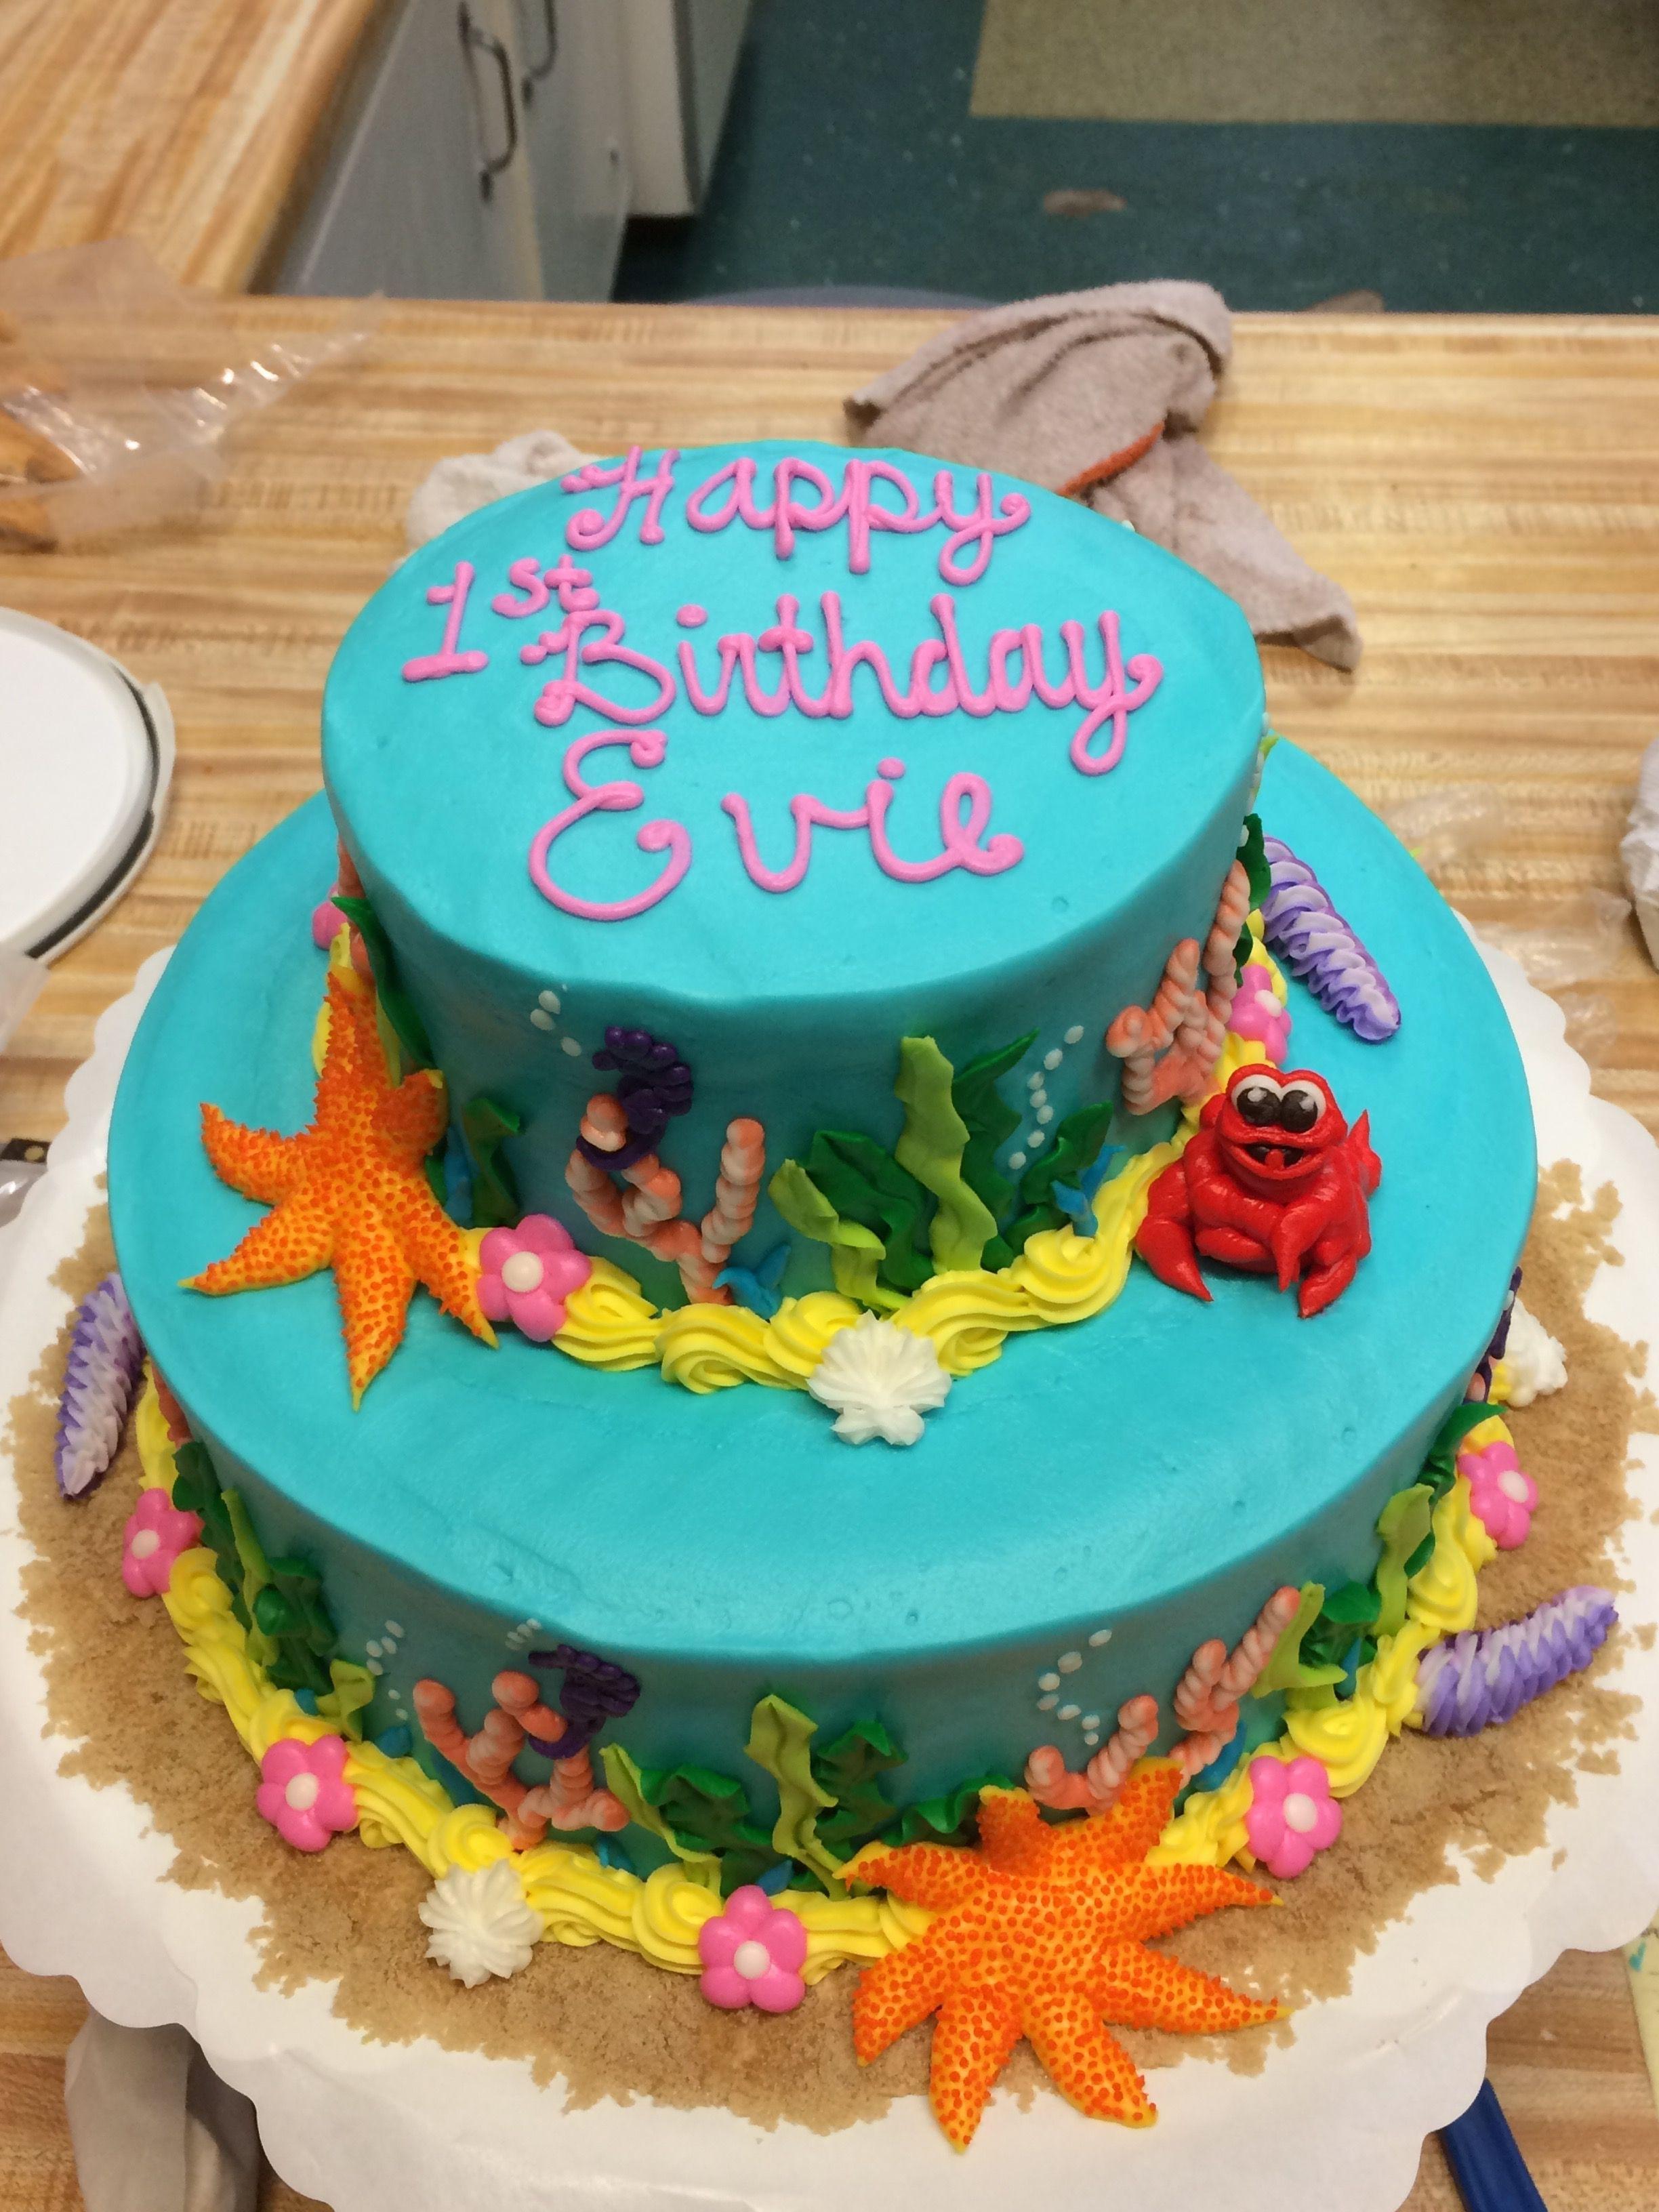 Decorated Birthday Cake With Under The Sea Theme Westhampton Pastry Shop Richmond VA Underthesea Buttercreamcake